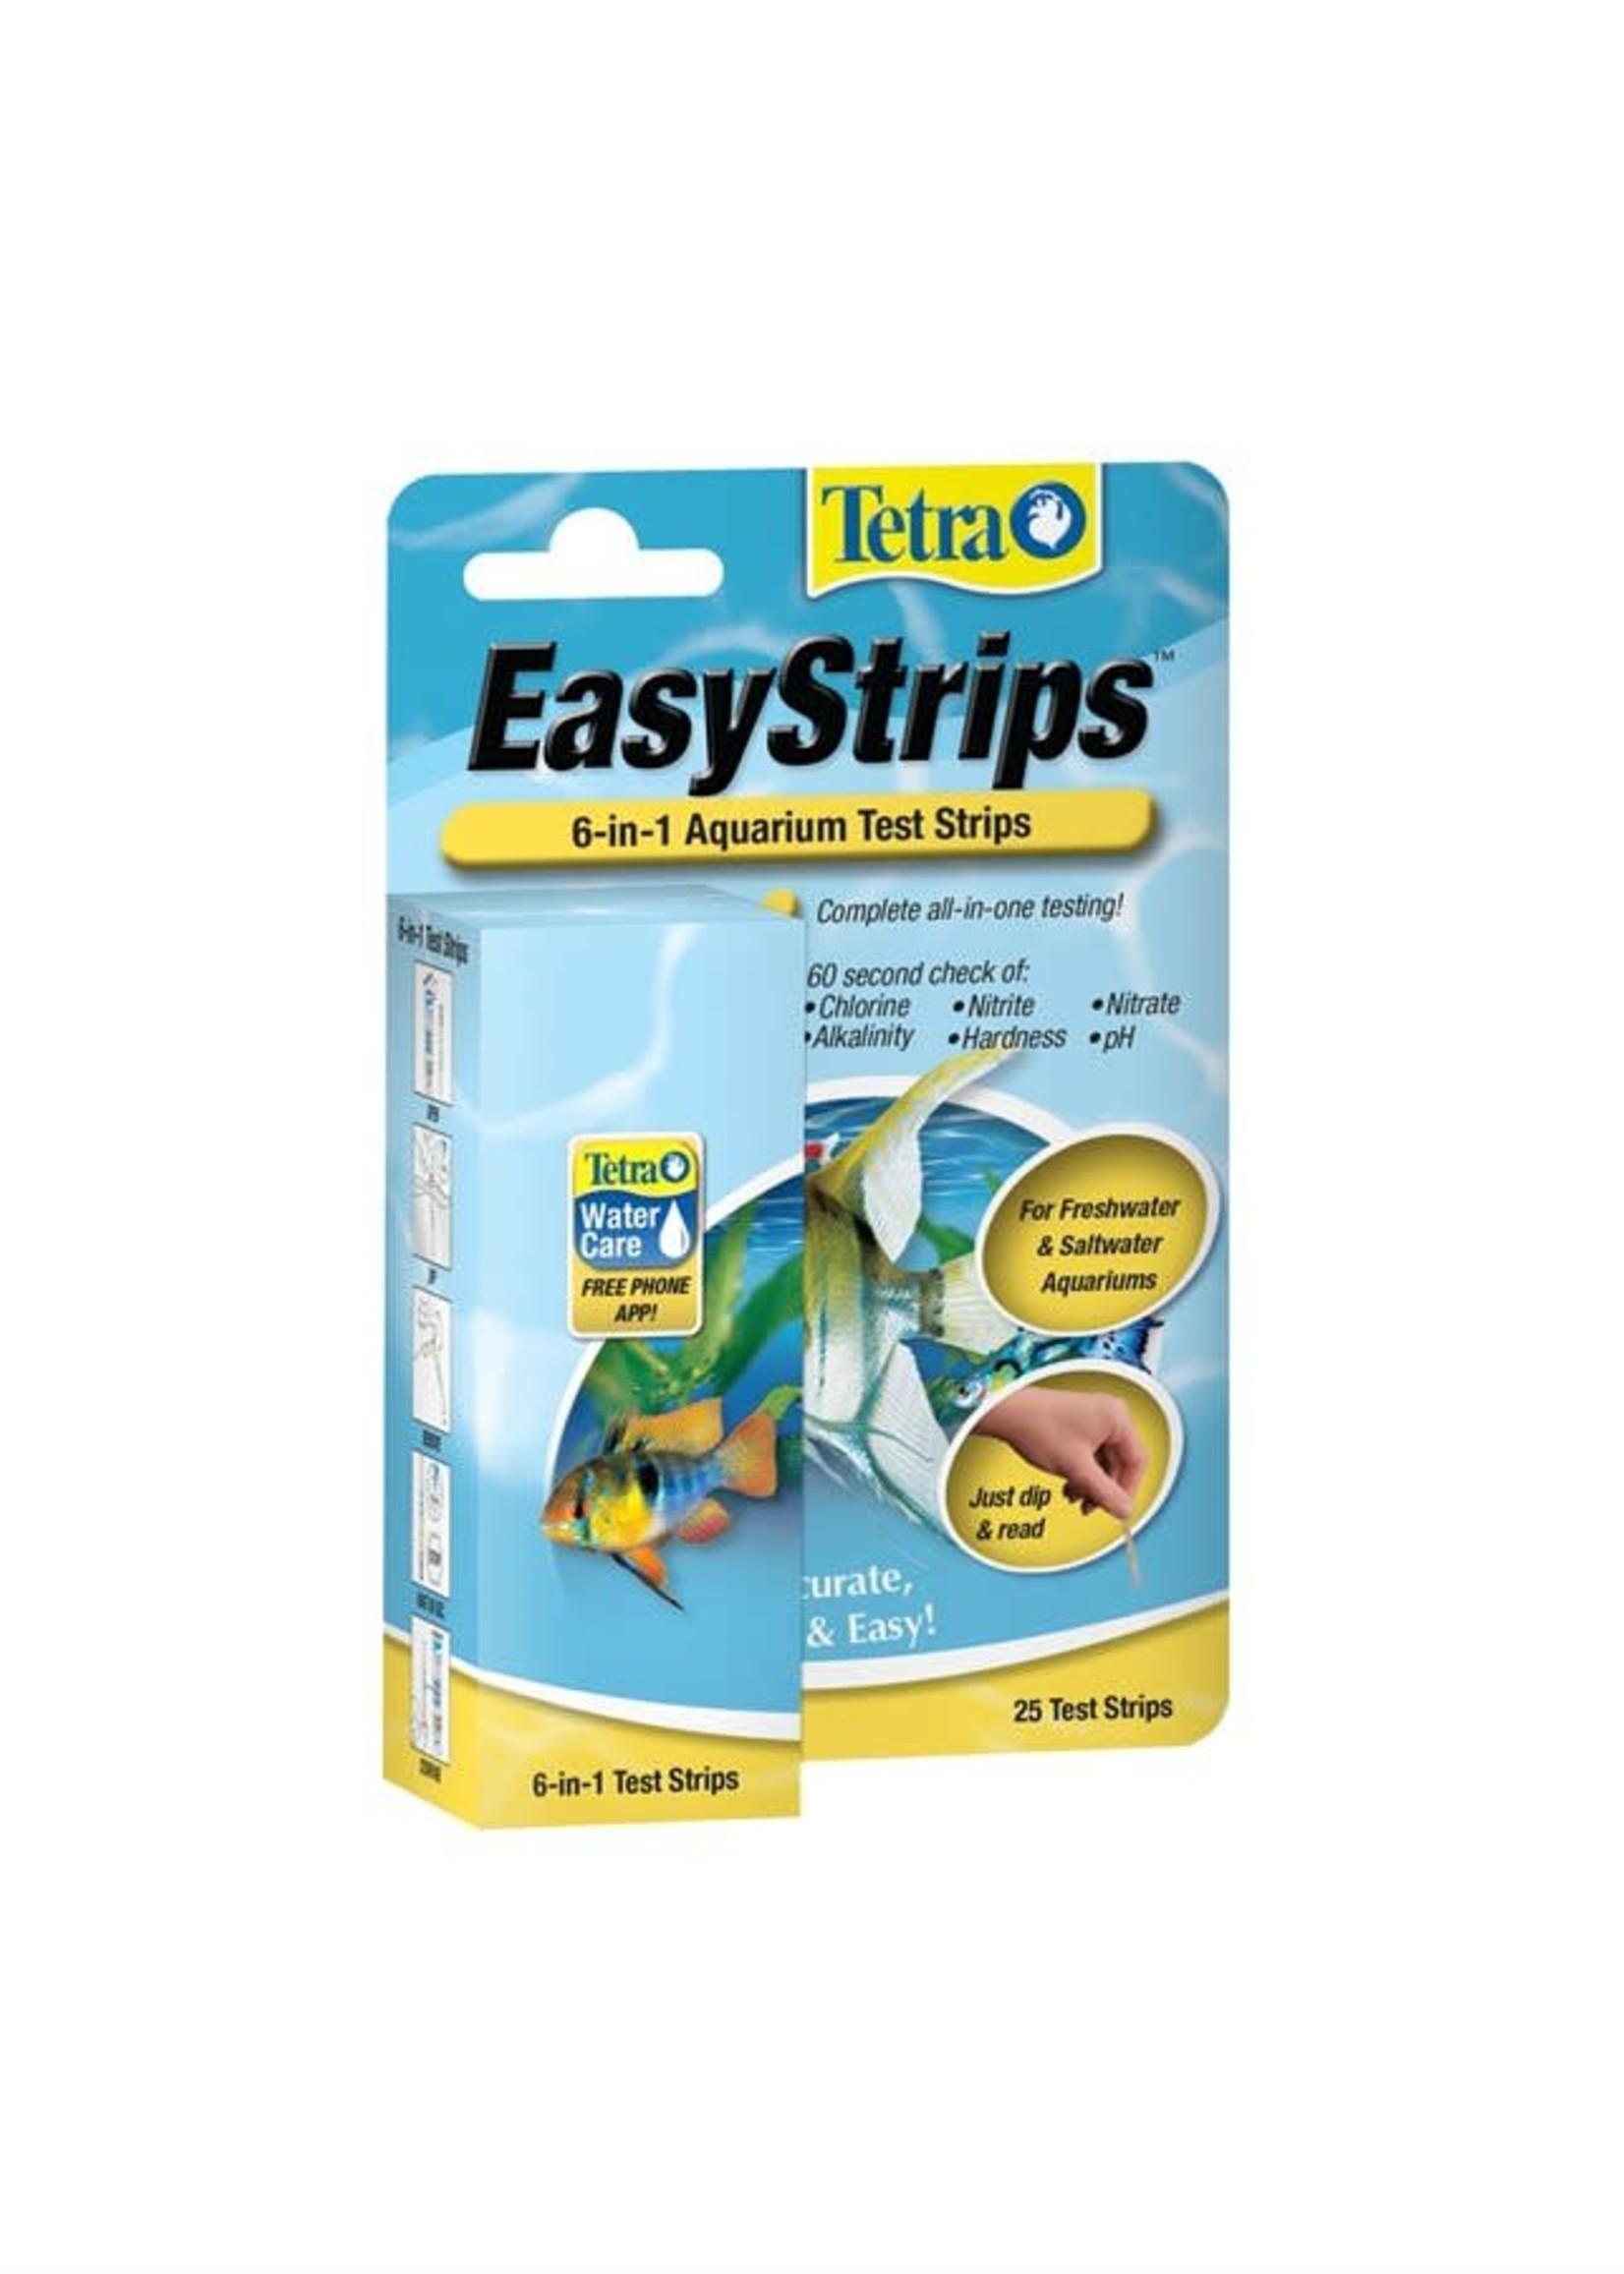 Tetra® Tetra EasyStrips 6-in-1 Test Strips 25pk